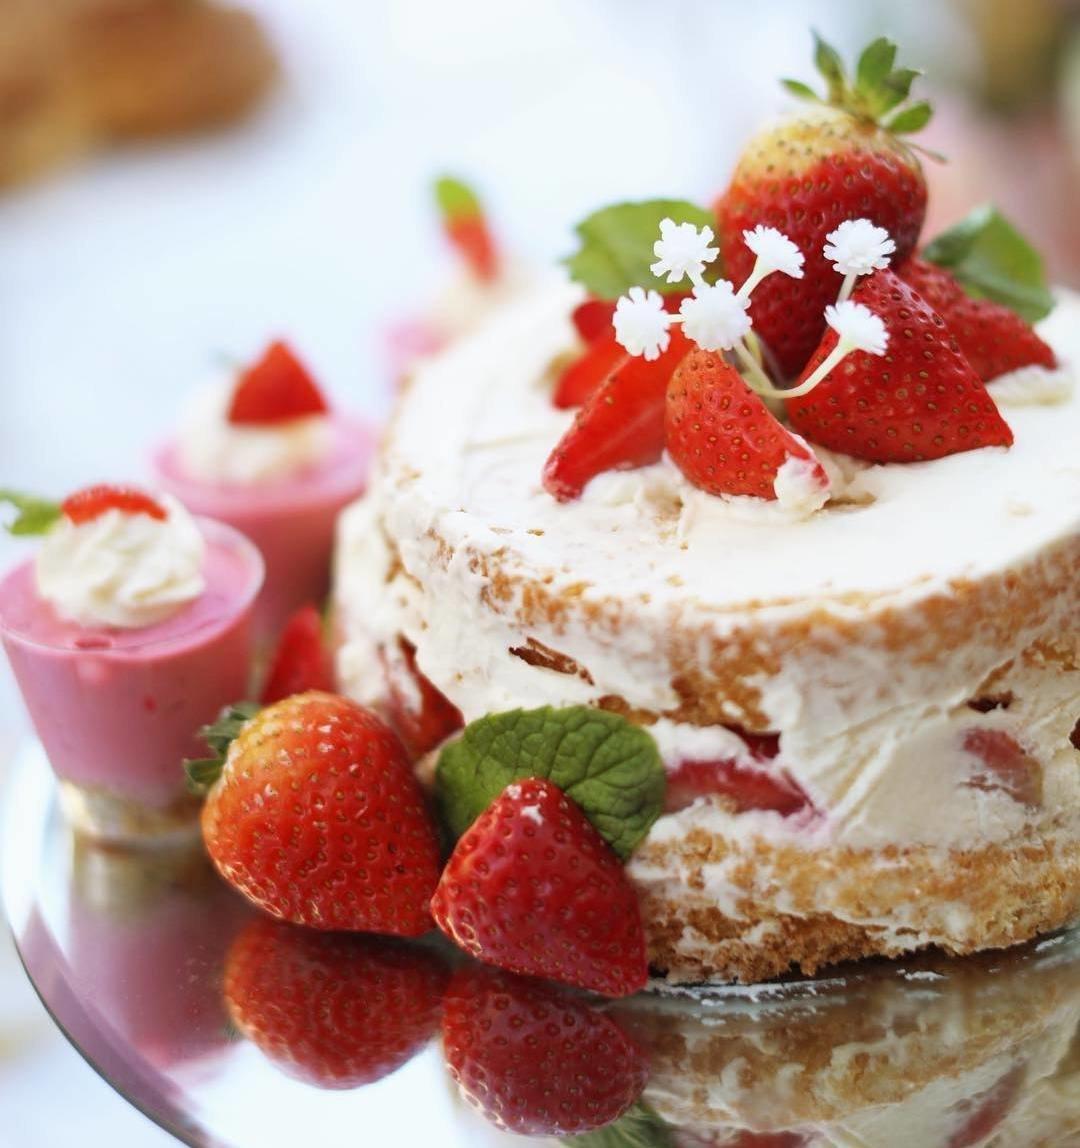 словно картинки тортов бисквит для